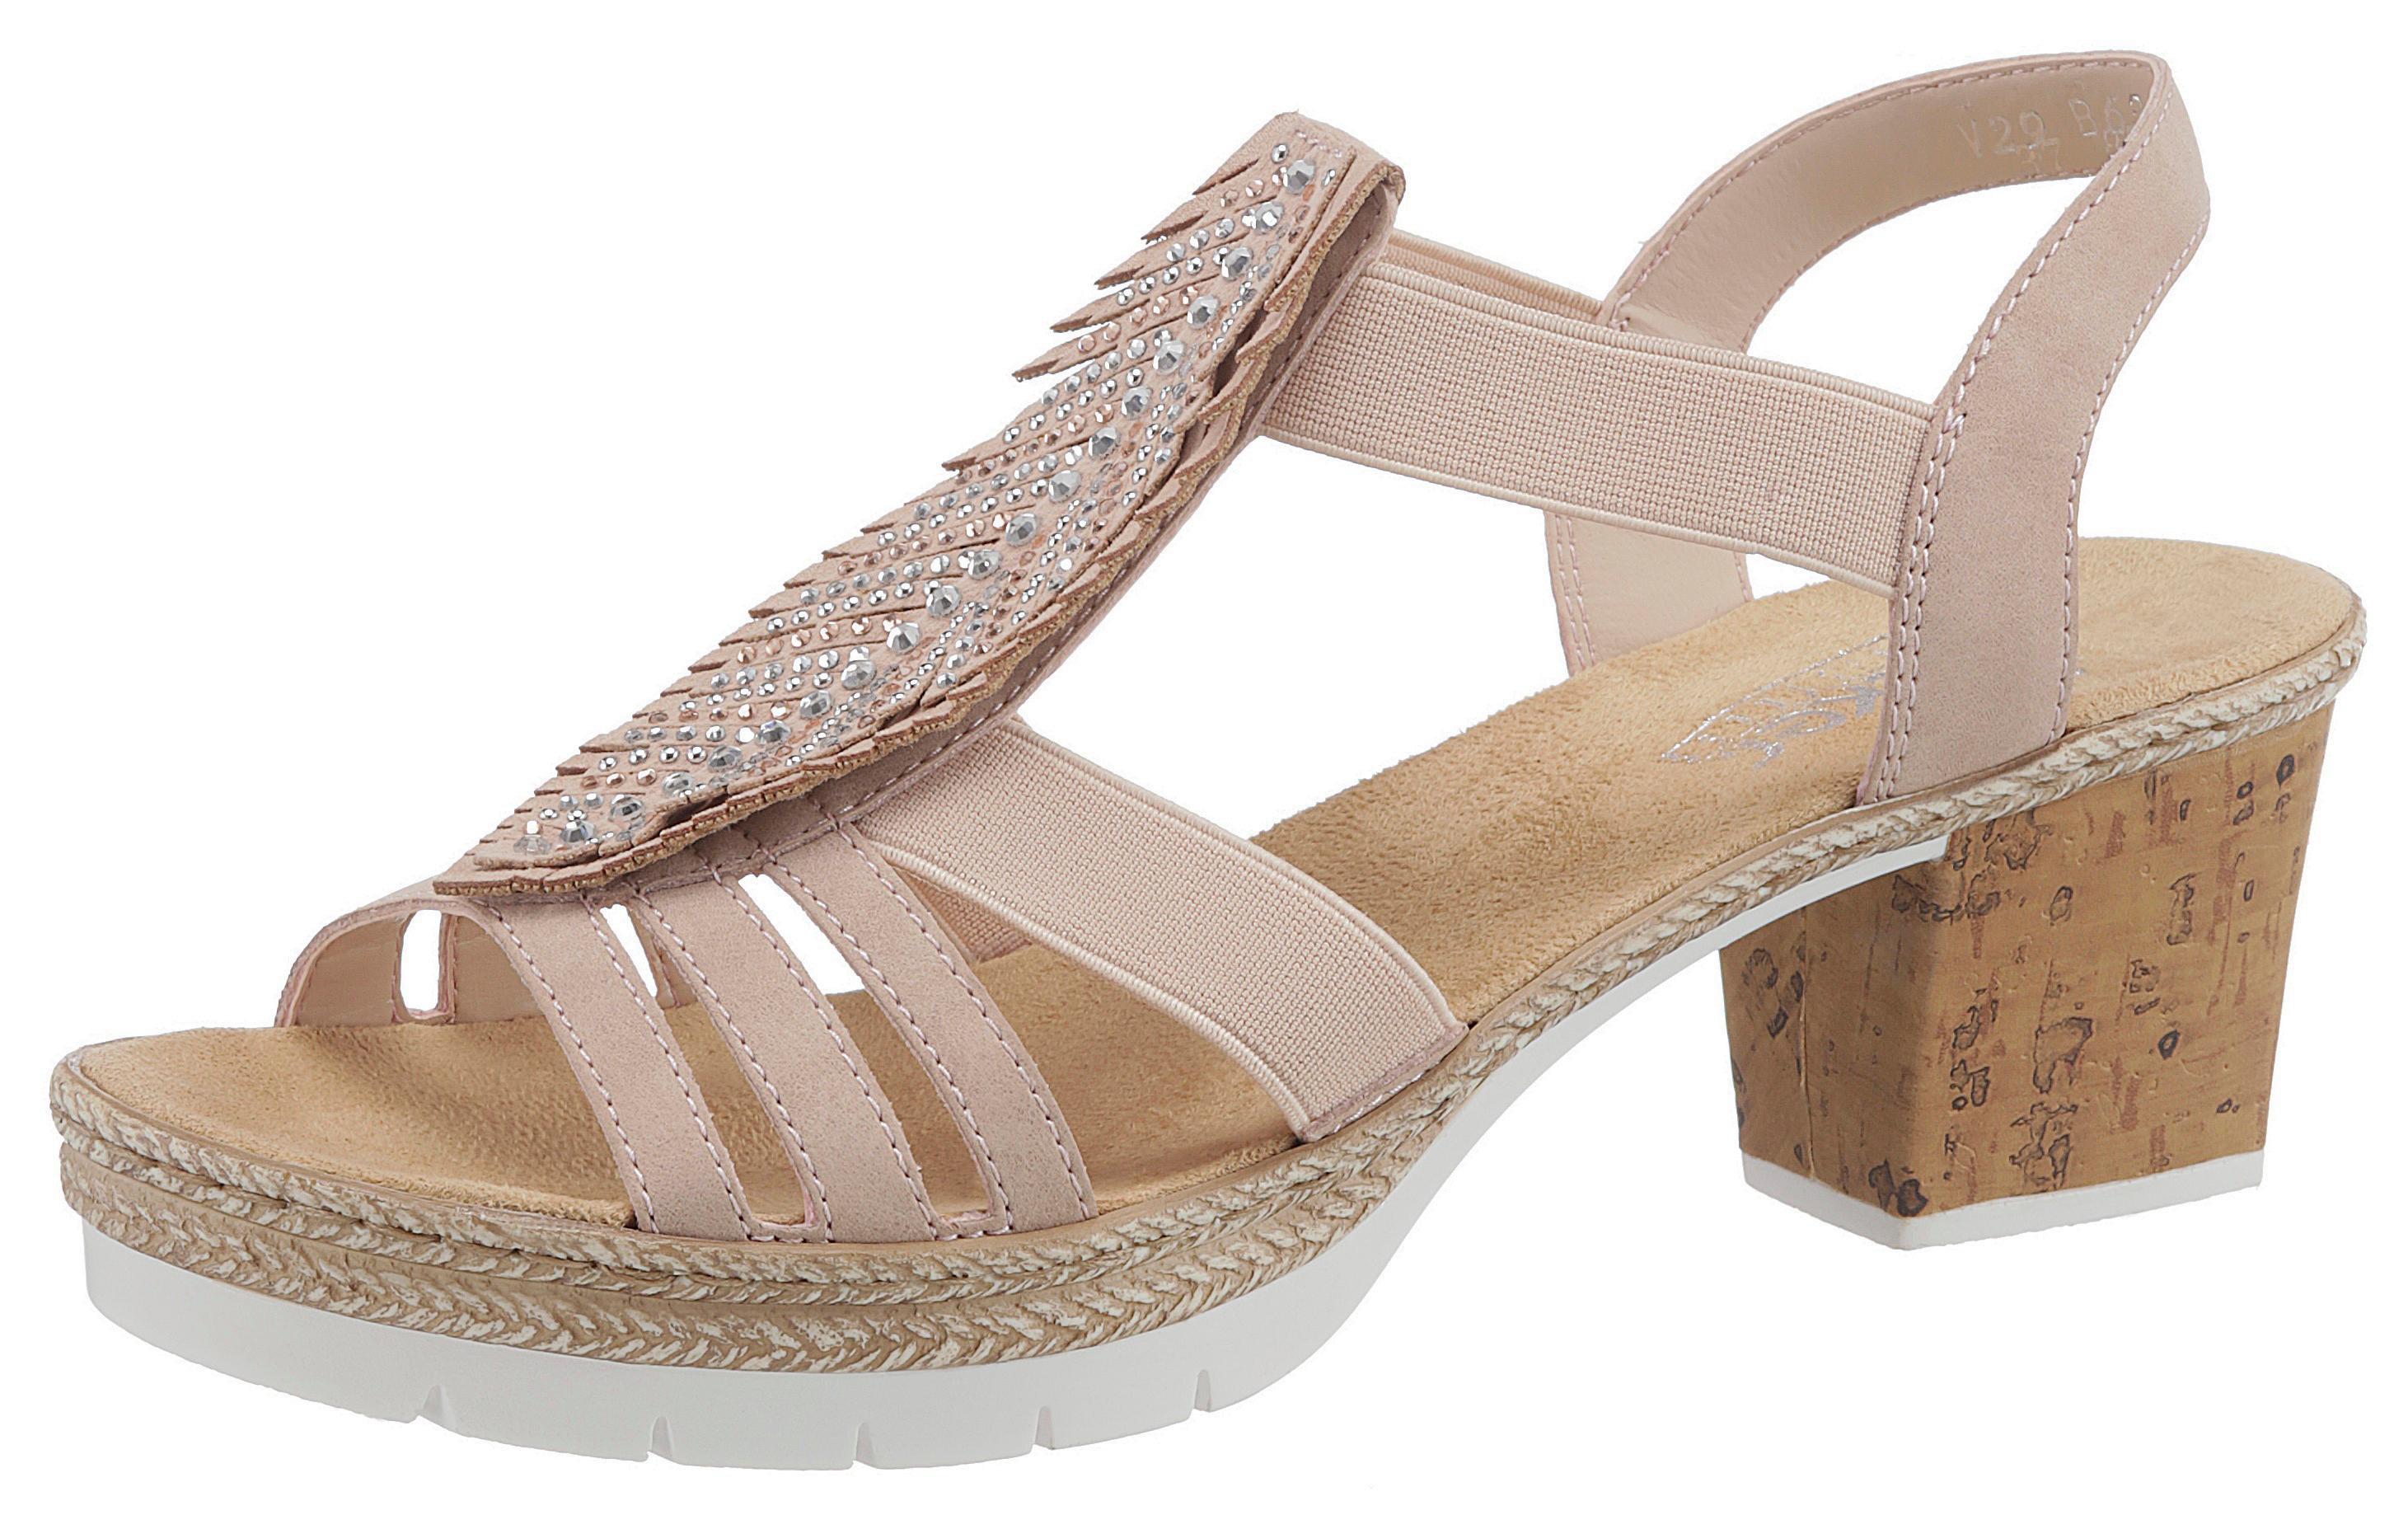 brand new 2e91a 765a1 Details zu Sandalette Rieker Damenmode Elegante Sandaletten Damen Sandalen